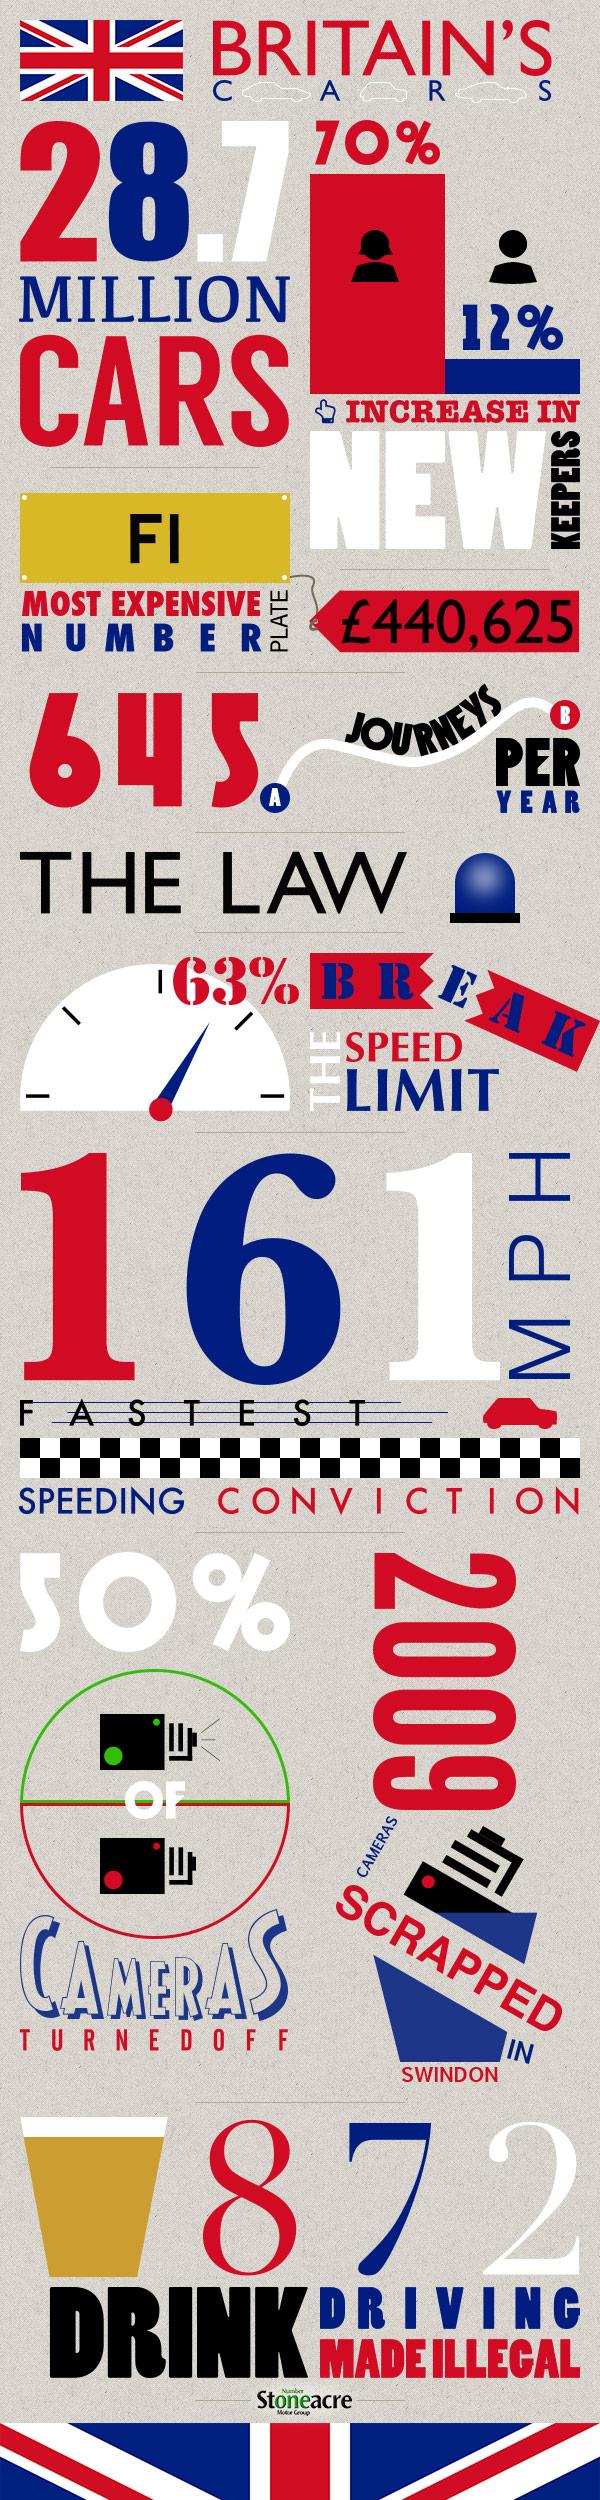 british-car-facts-infographic_5256ac7da5a62